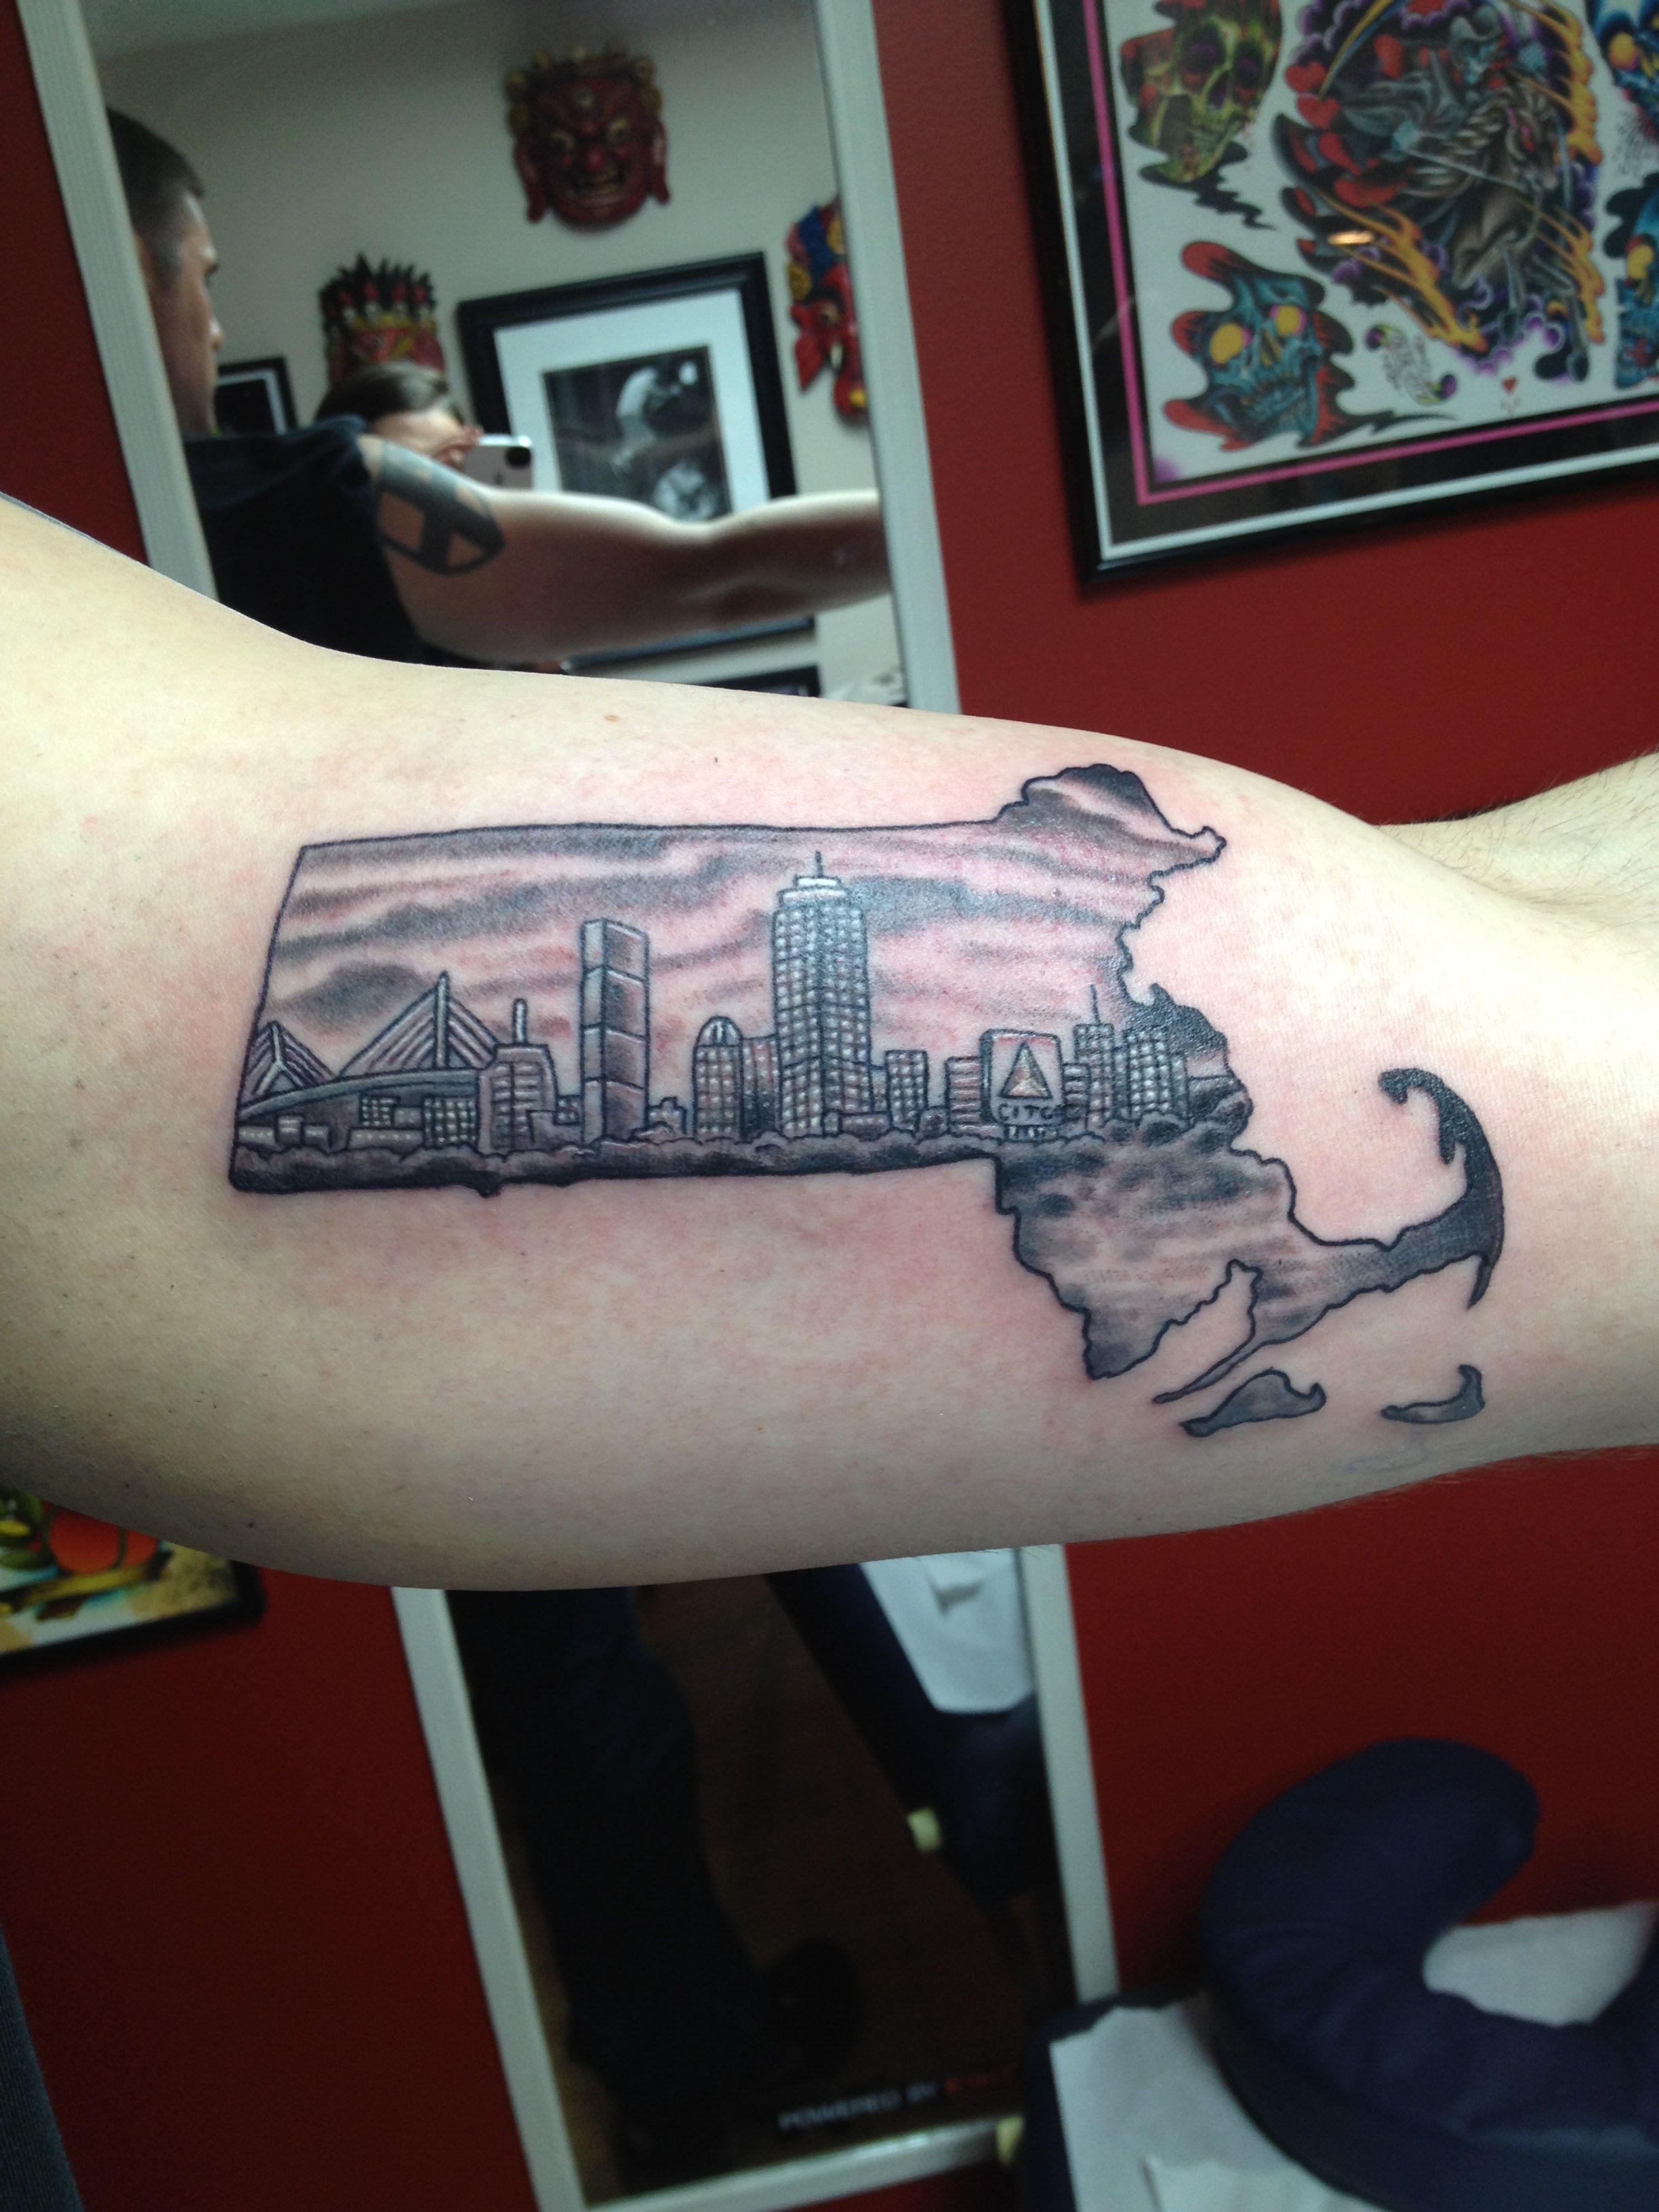 Massachusetts tattoo | Tatt ideas | Massachusetts tattoo, Tattoos ...